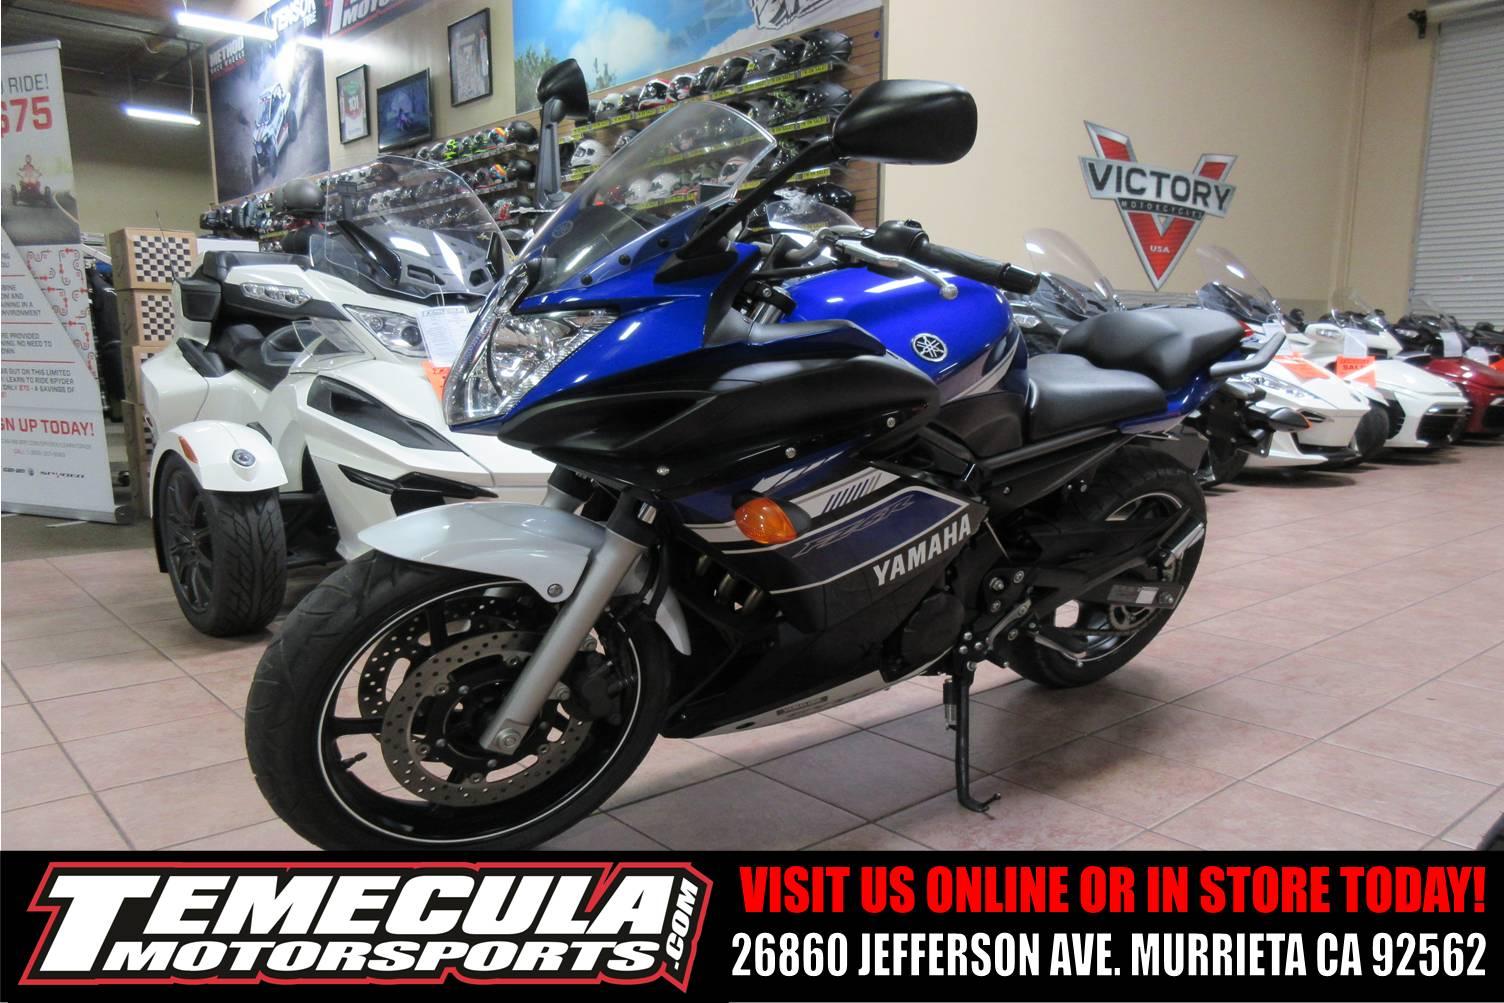 Used 2013 Yamaha FZ6R Motorcycles in Murrieta, CA | Stock Number ...